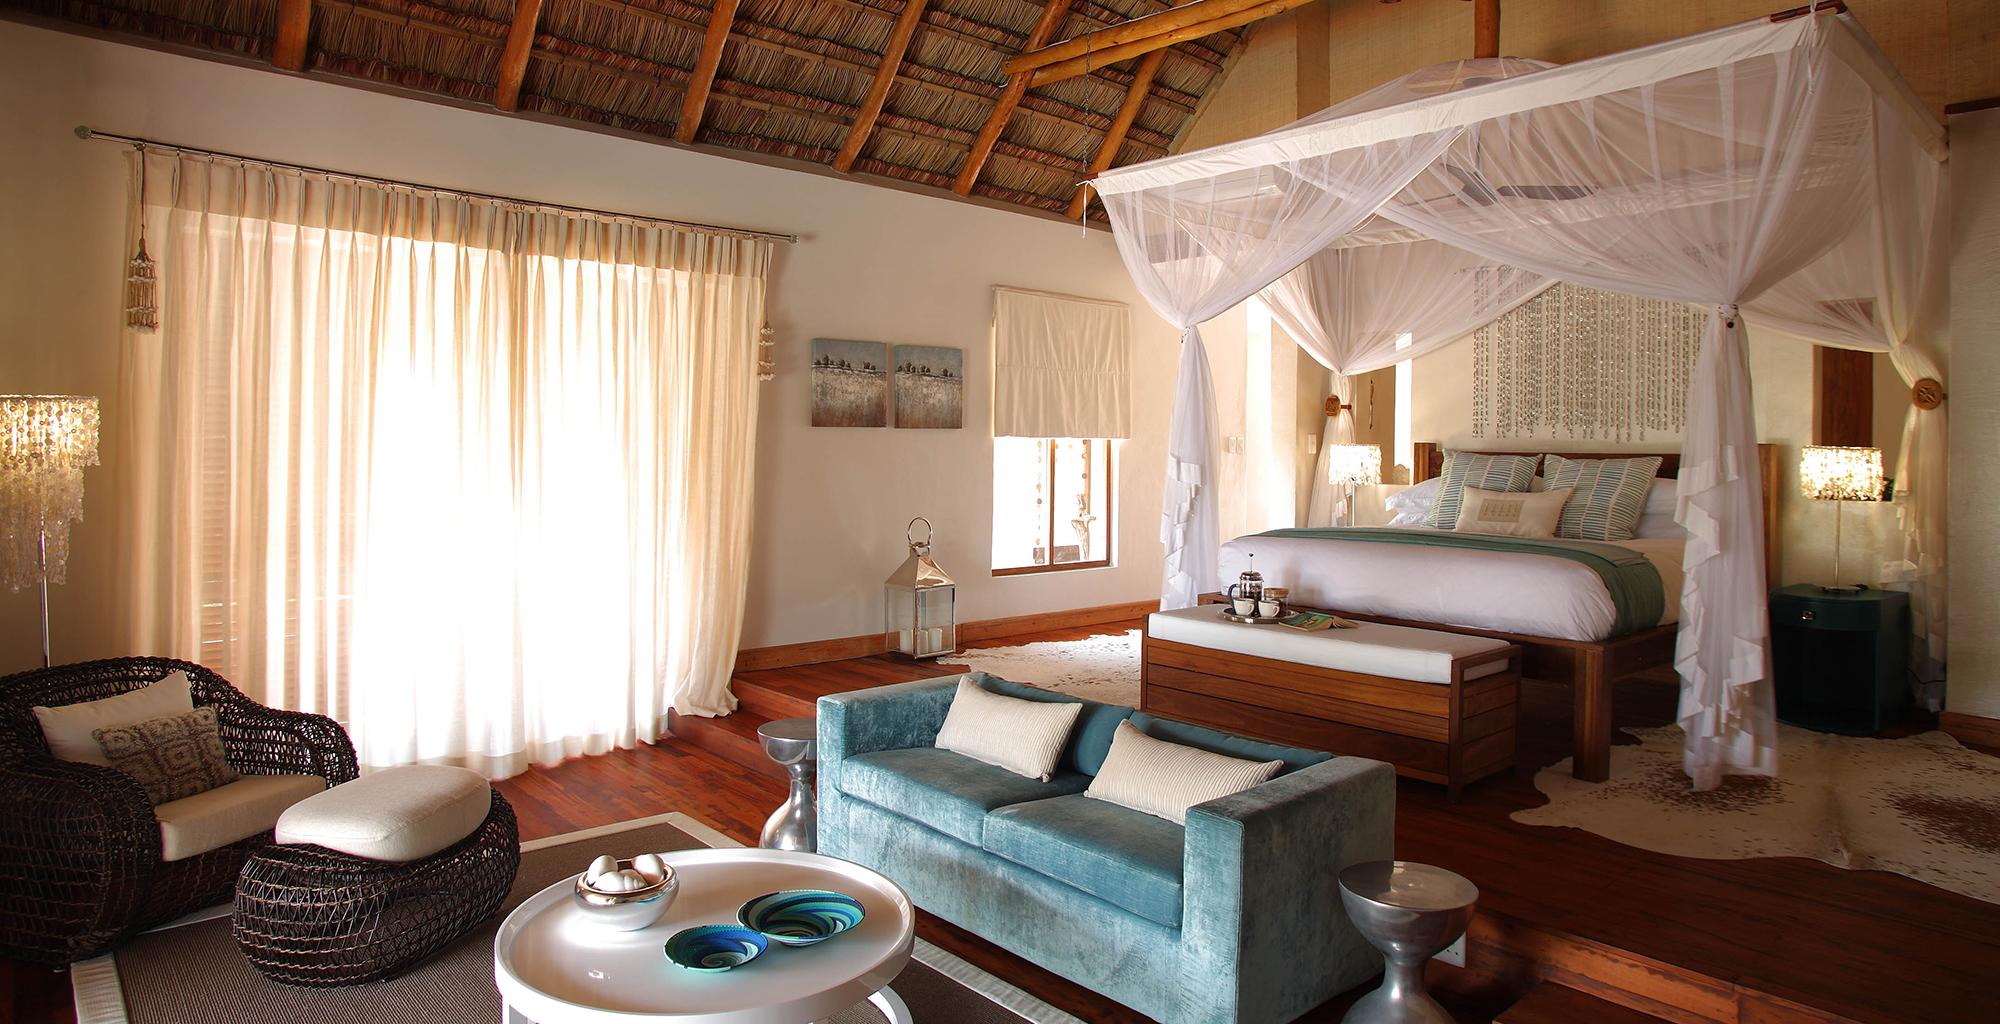 Mozambique-Bazaruto-Archipelago-Azura-Benguerra-Presidential-Bedroom